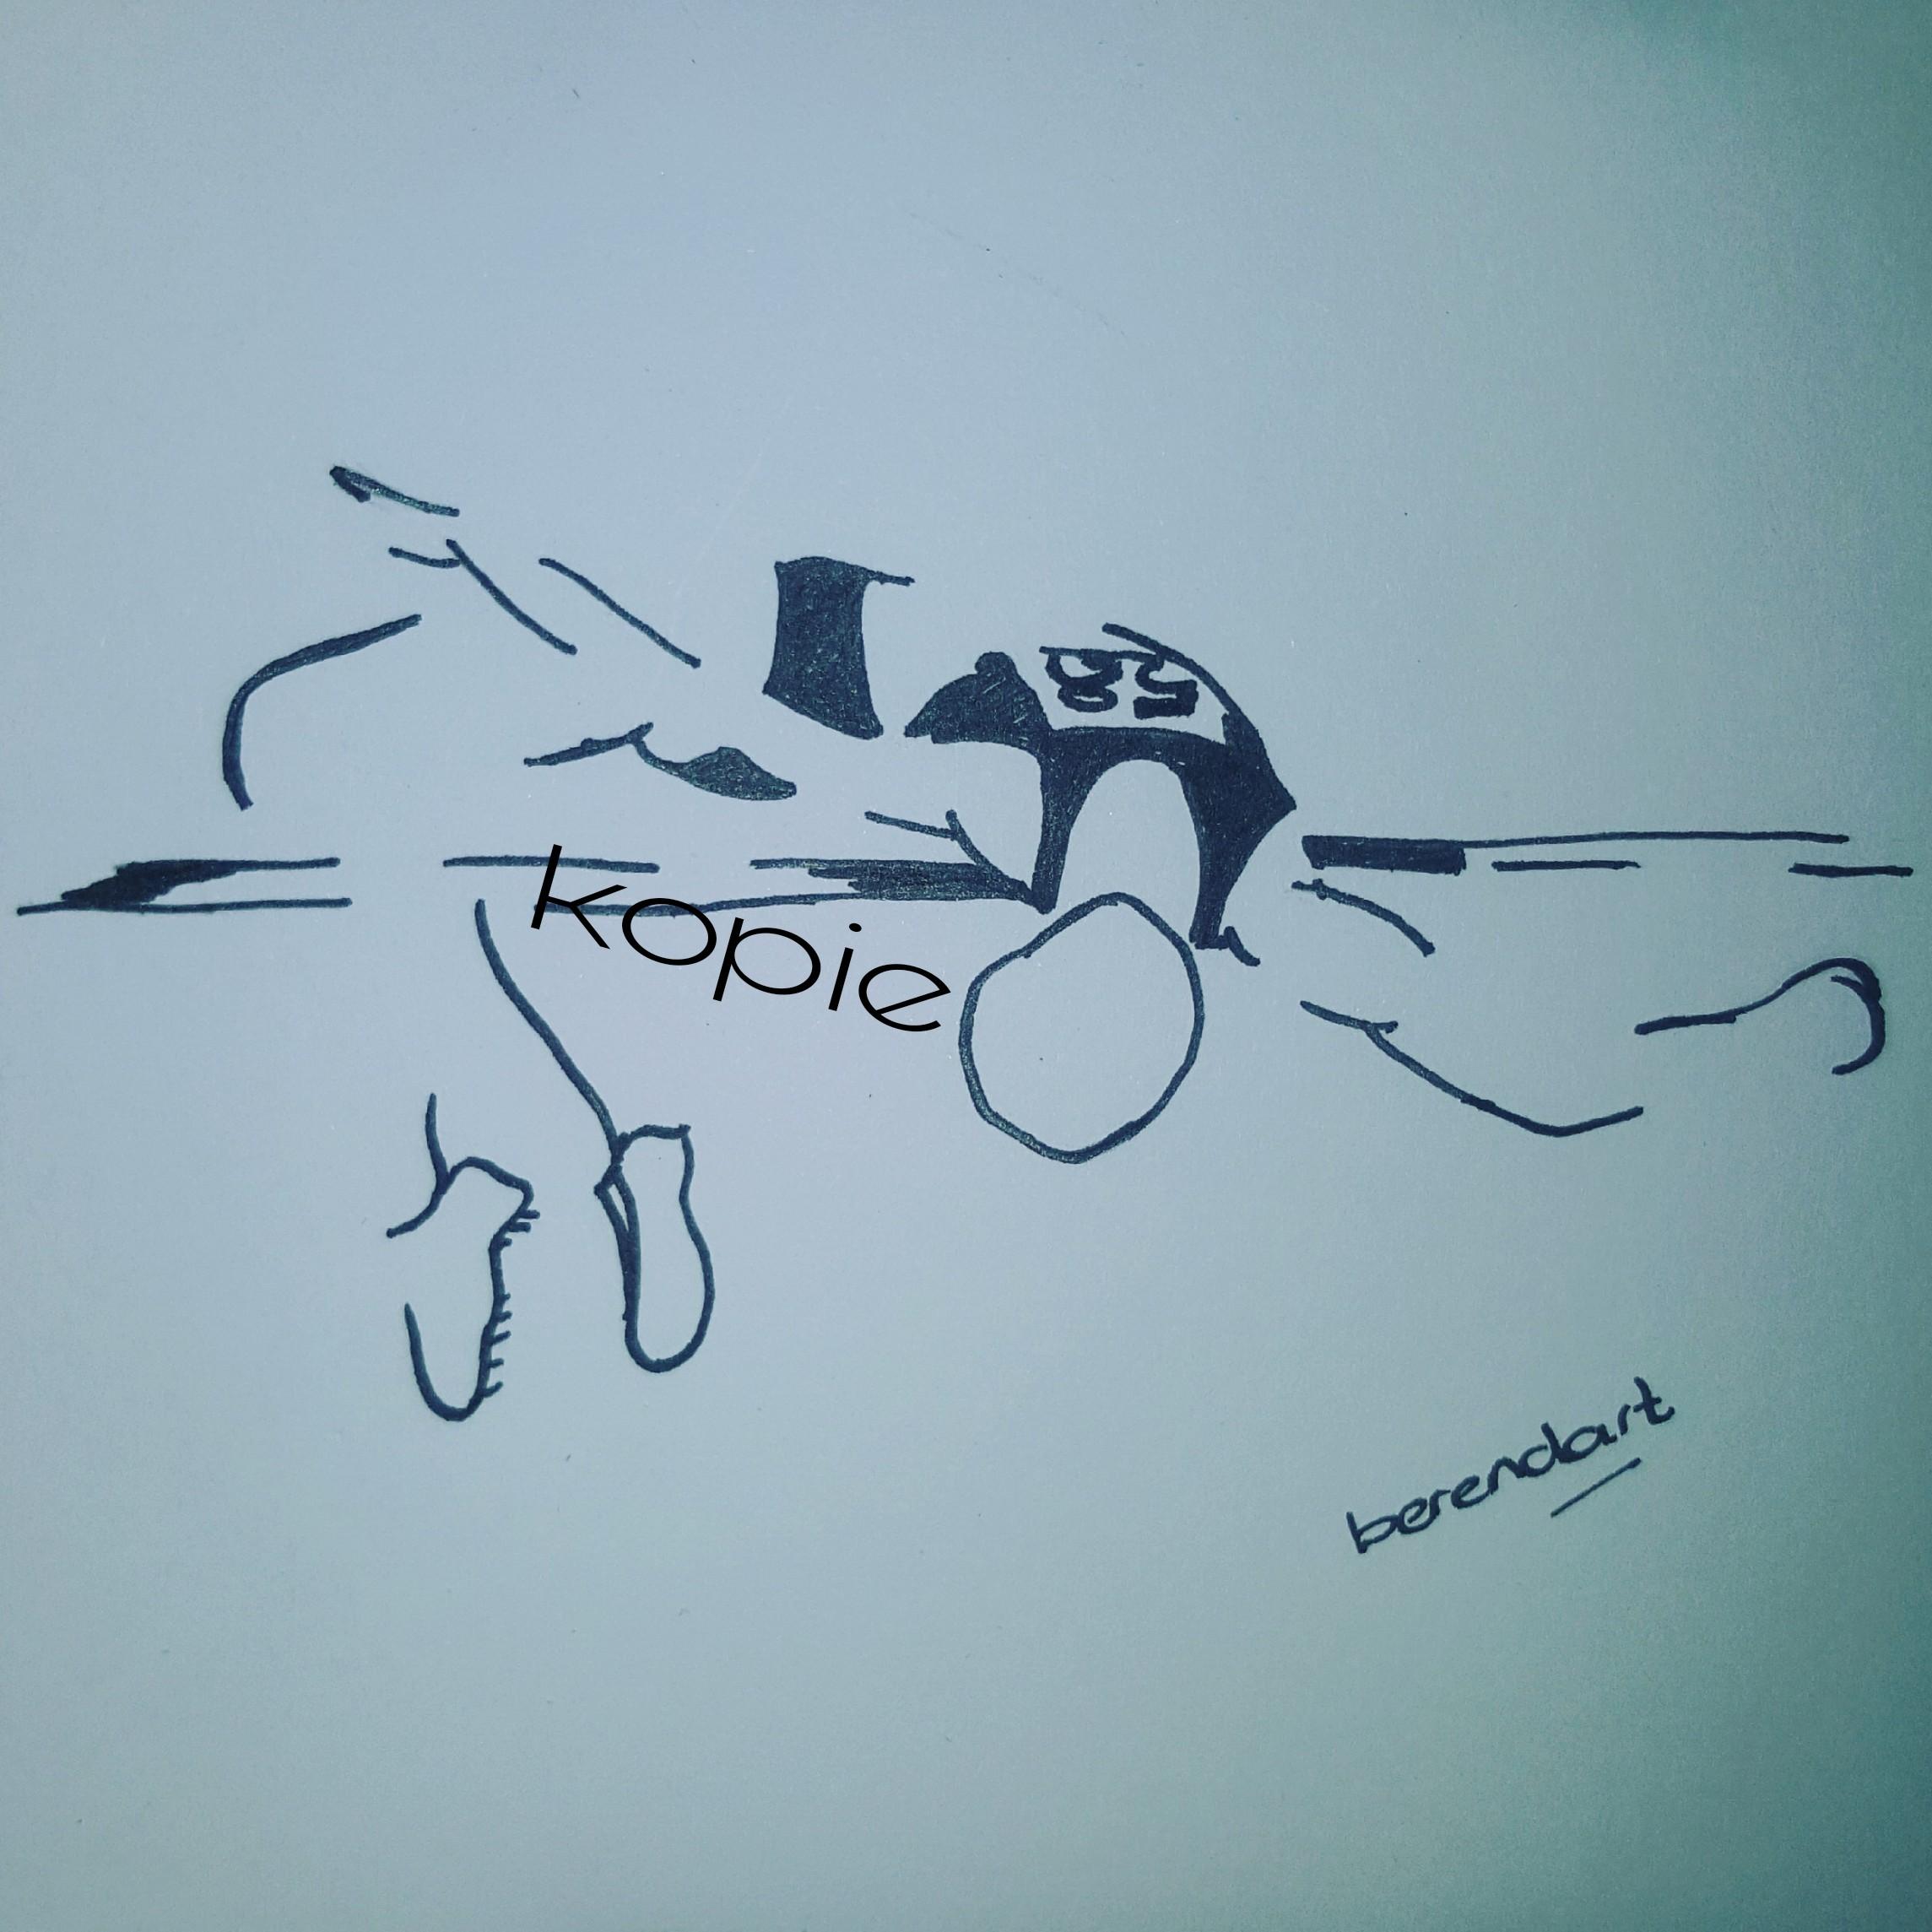 Hoogspringer